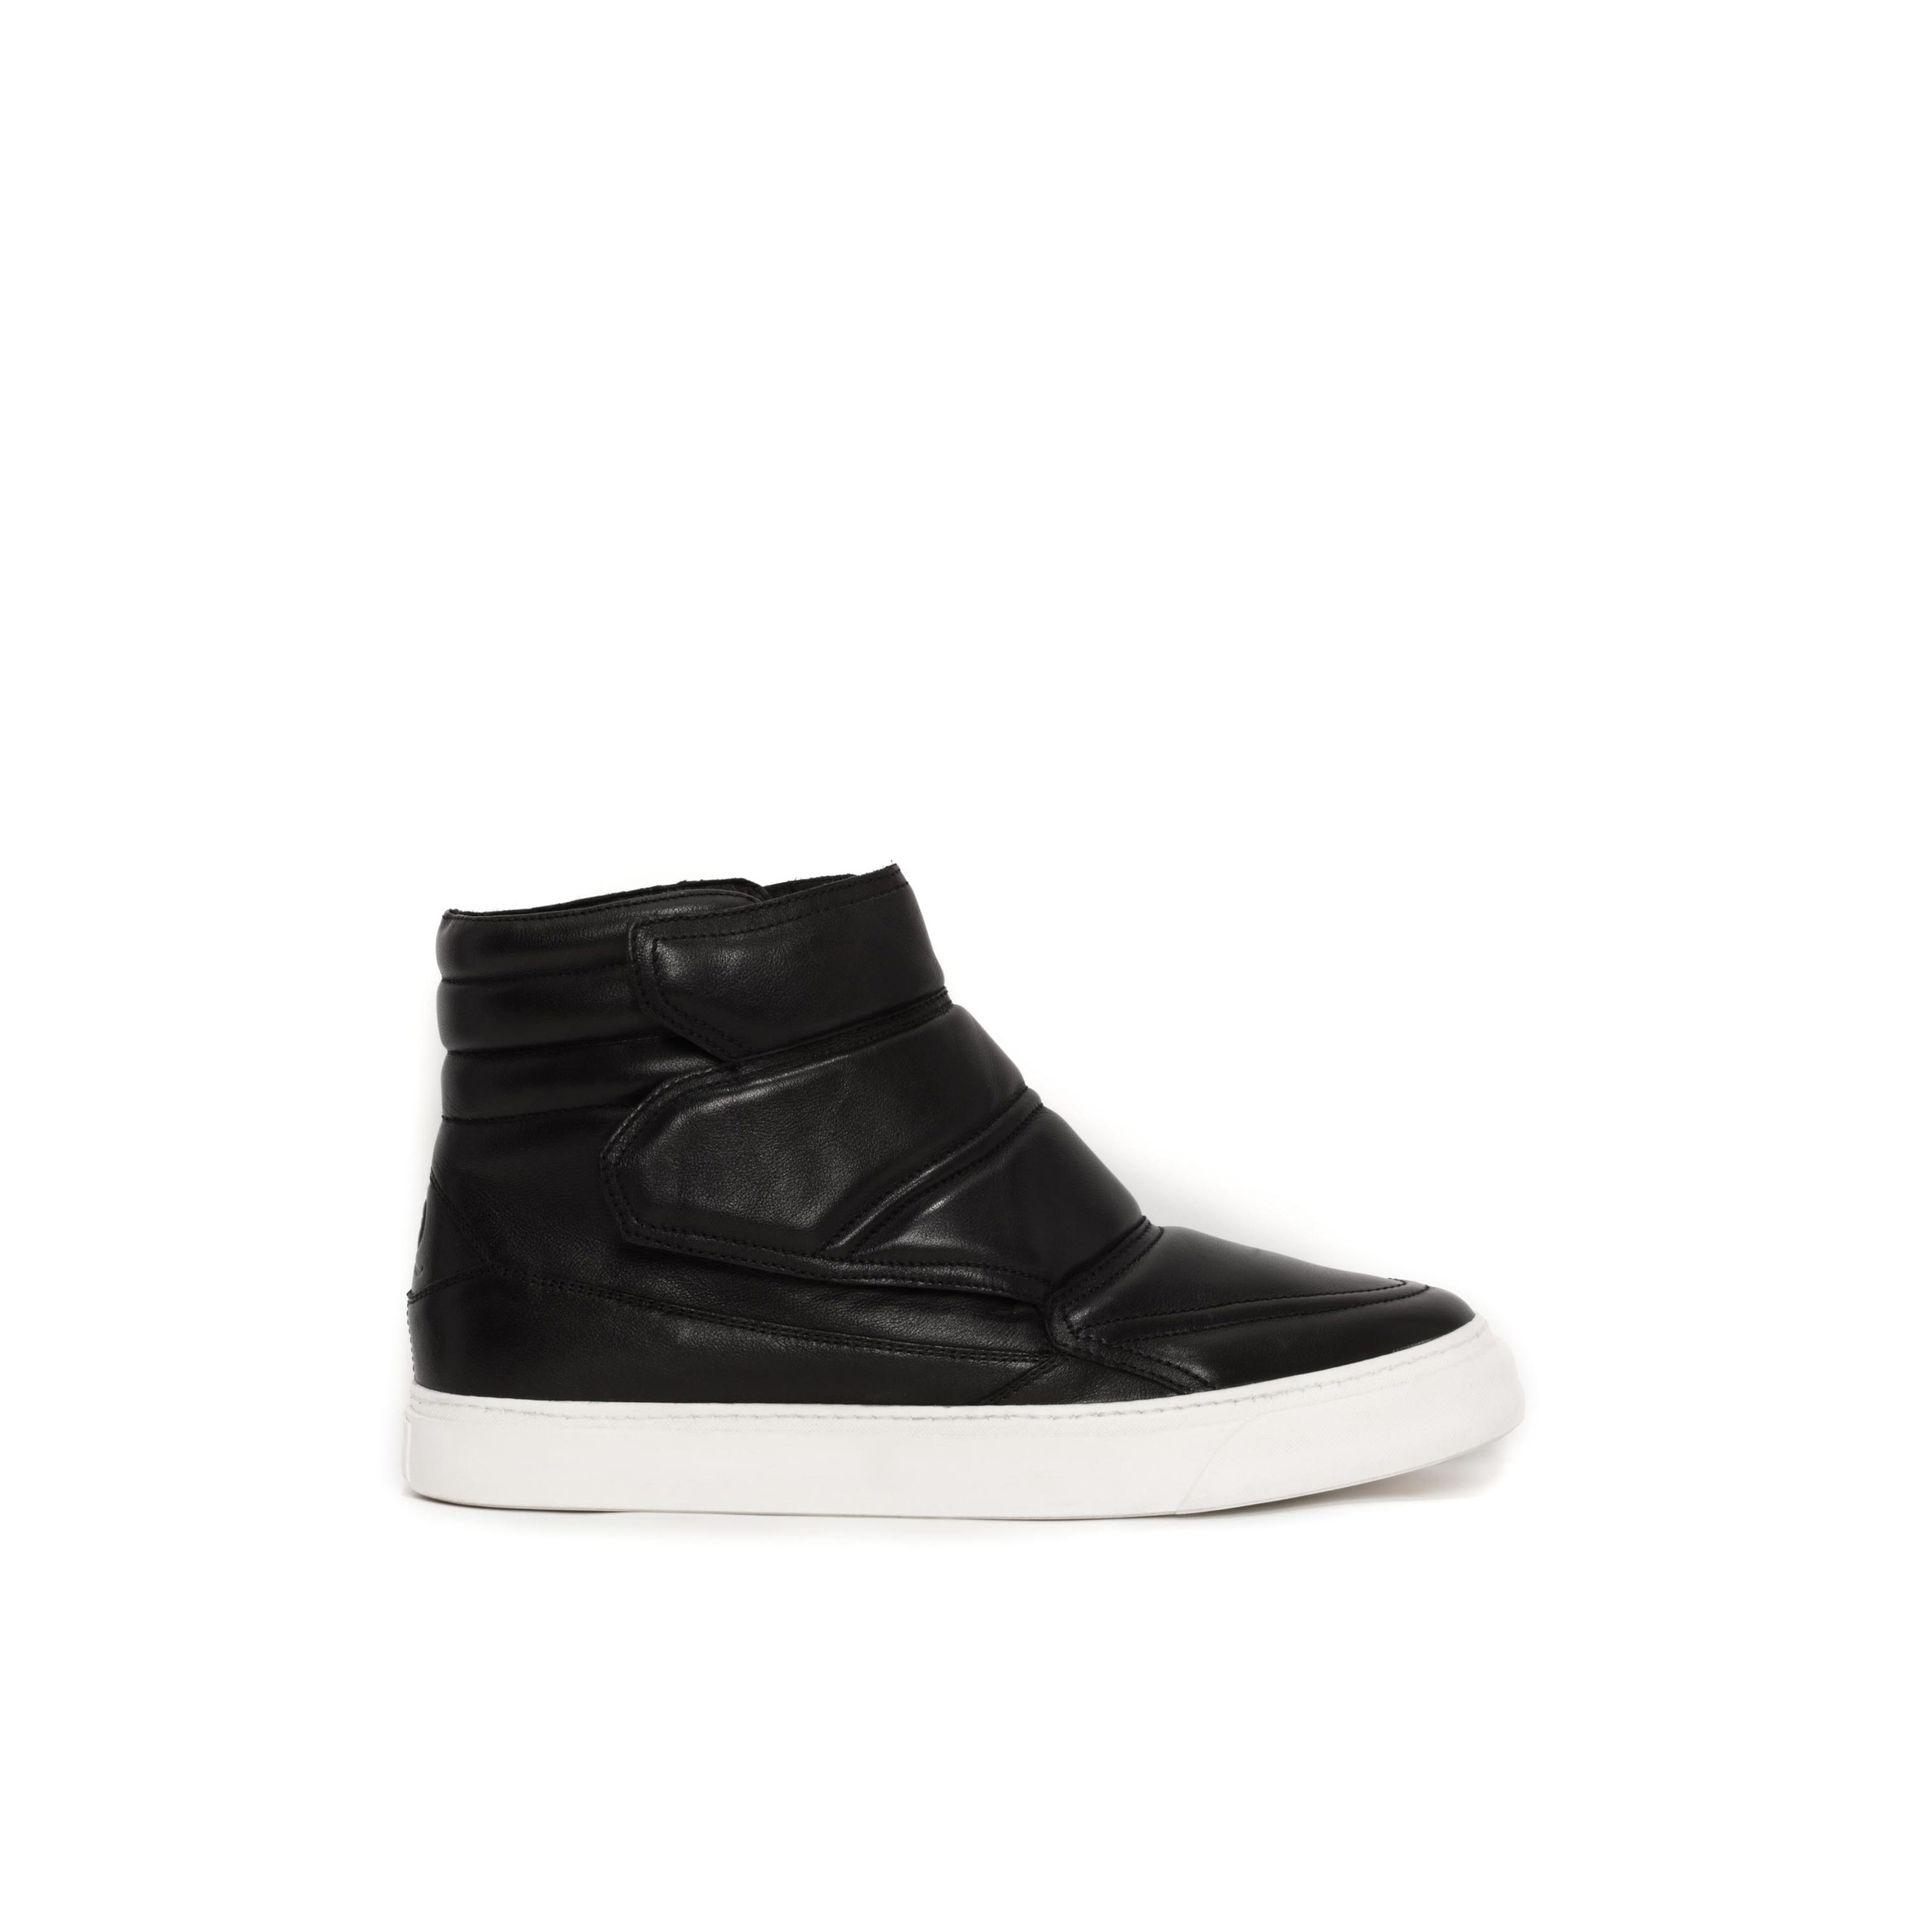 Mcq Leather Neu High Top Sneaker in Black for Men